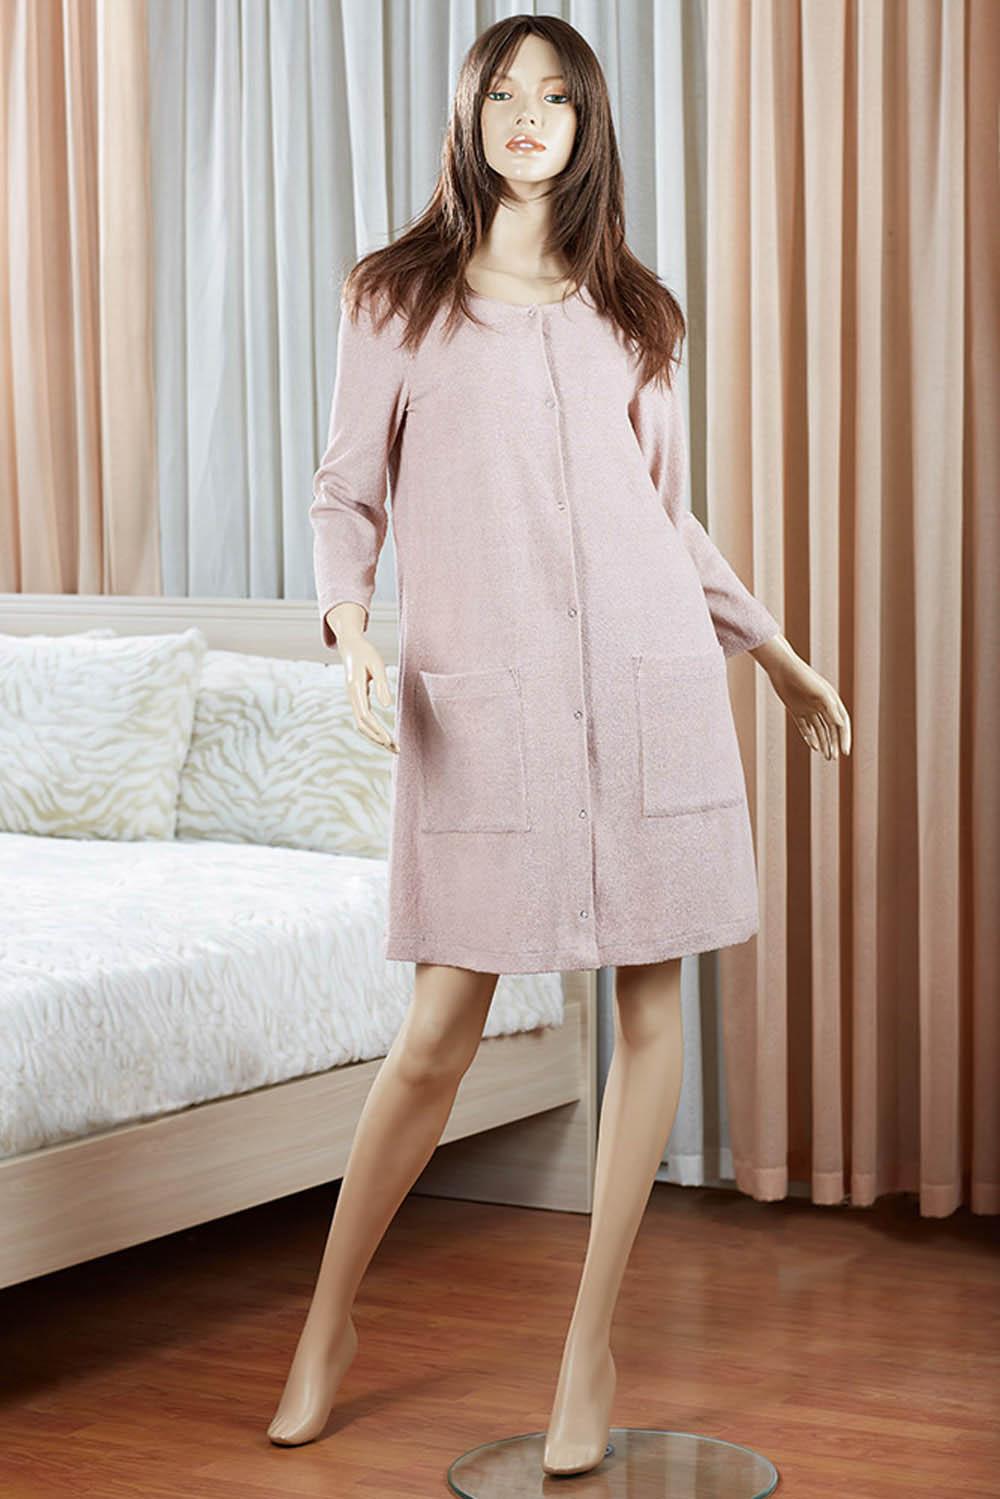 комплект мужской primavelle m diego Туники, сарафаны Primavelle Одежда для дома Susanna Цвет: Бежевый (M-L)